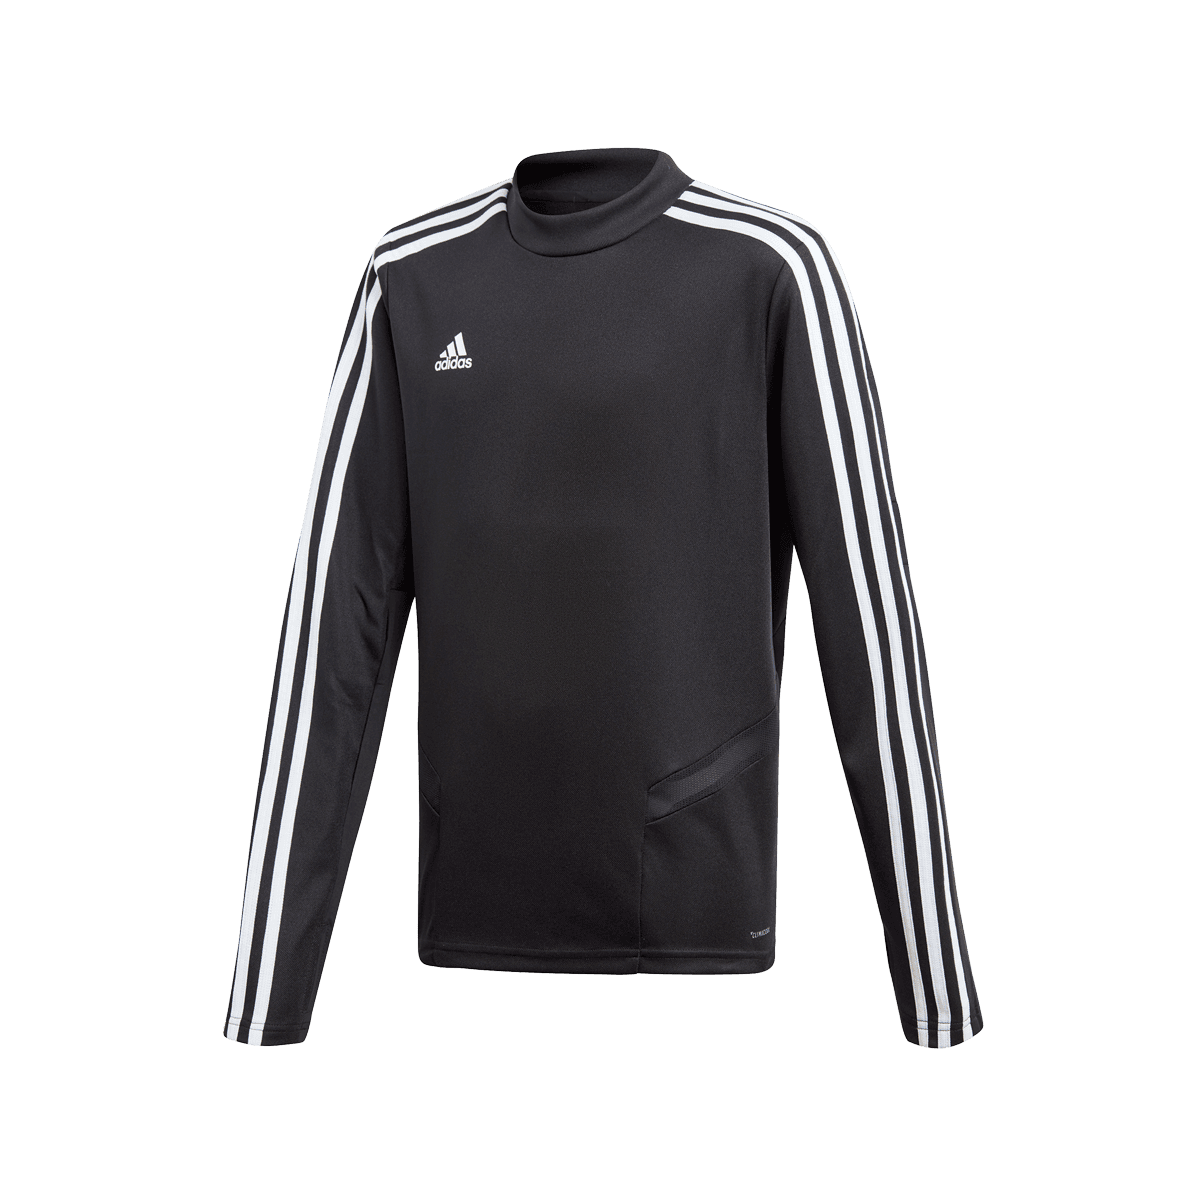 adidas Kinder Sweater Tiro 19 Training Top schwarzweiß